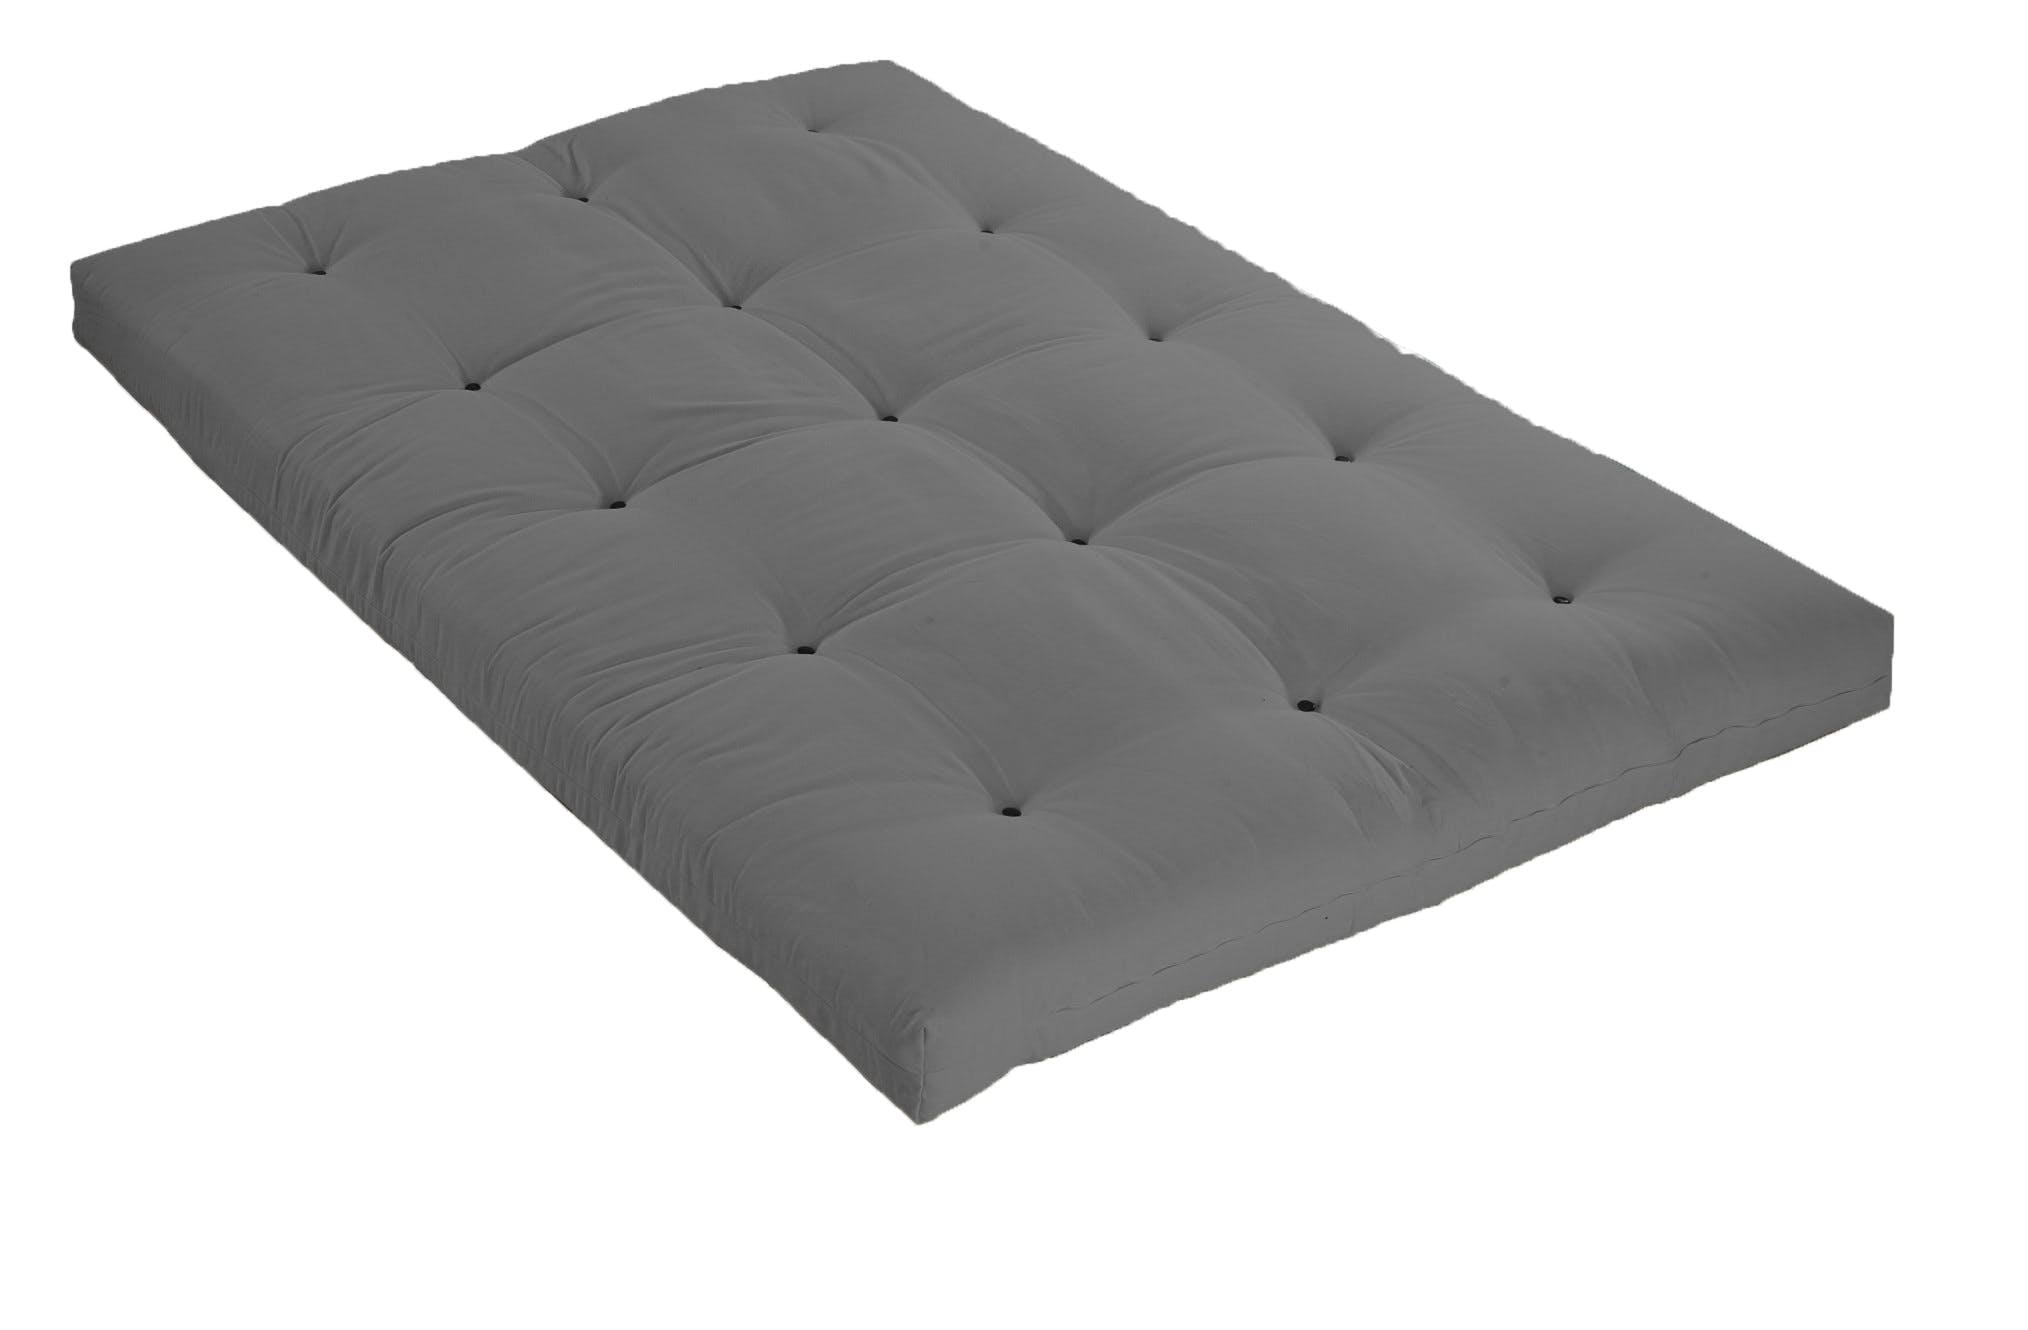 Véritable Futon coton QUEEN SIZE 160 X 200 cm gris